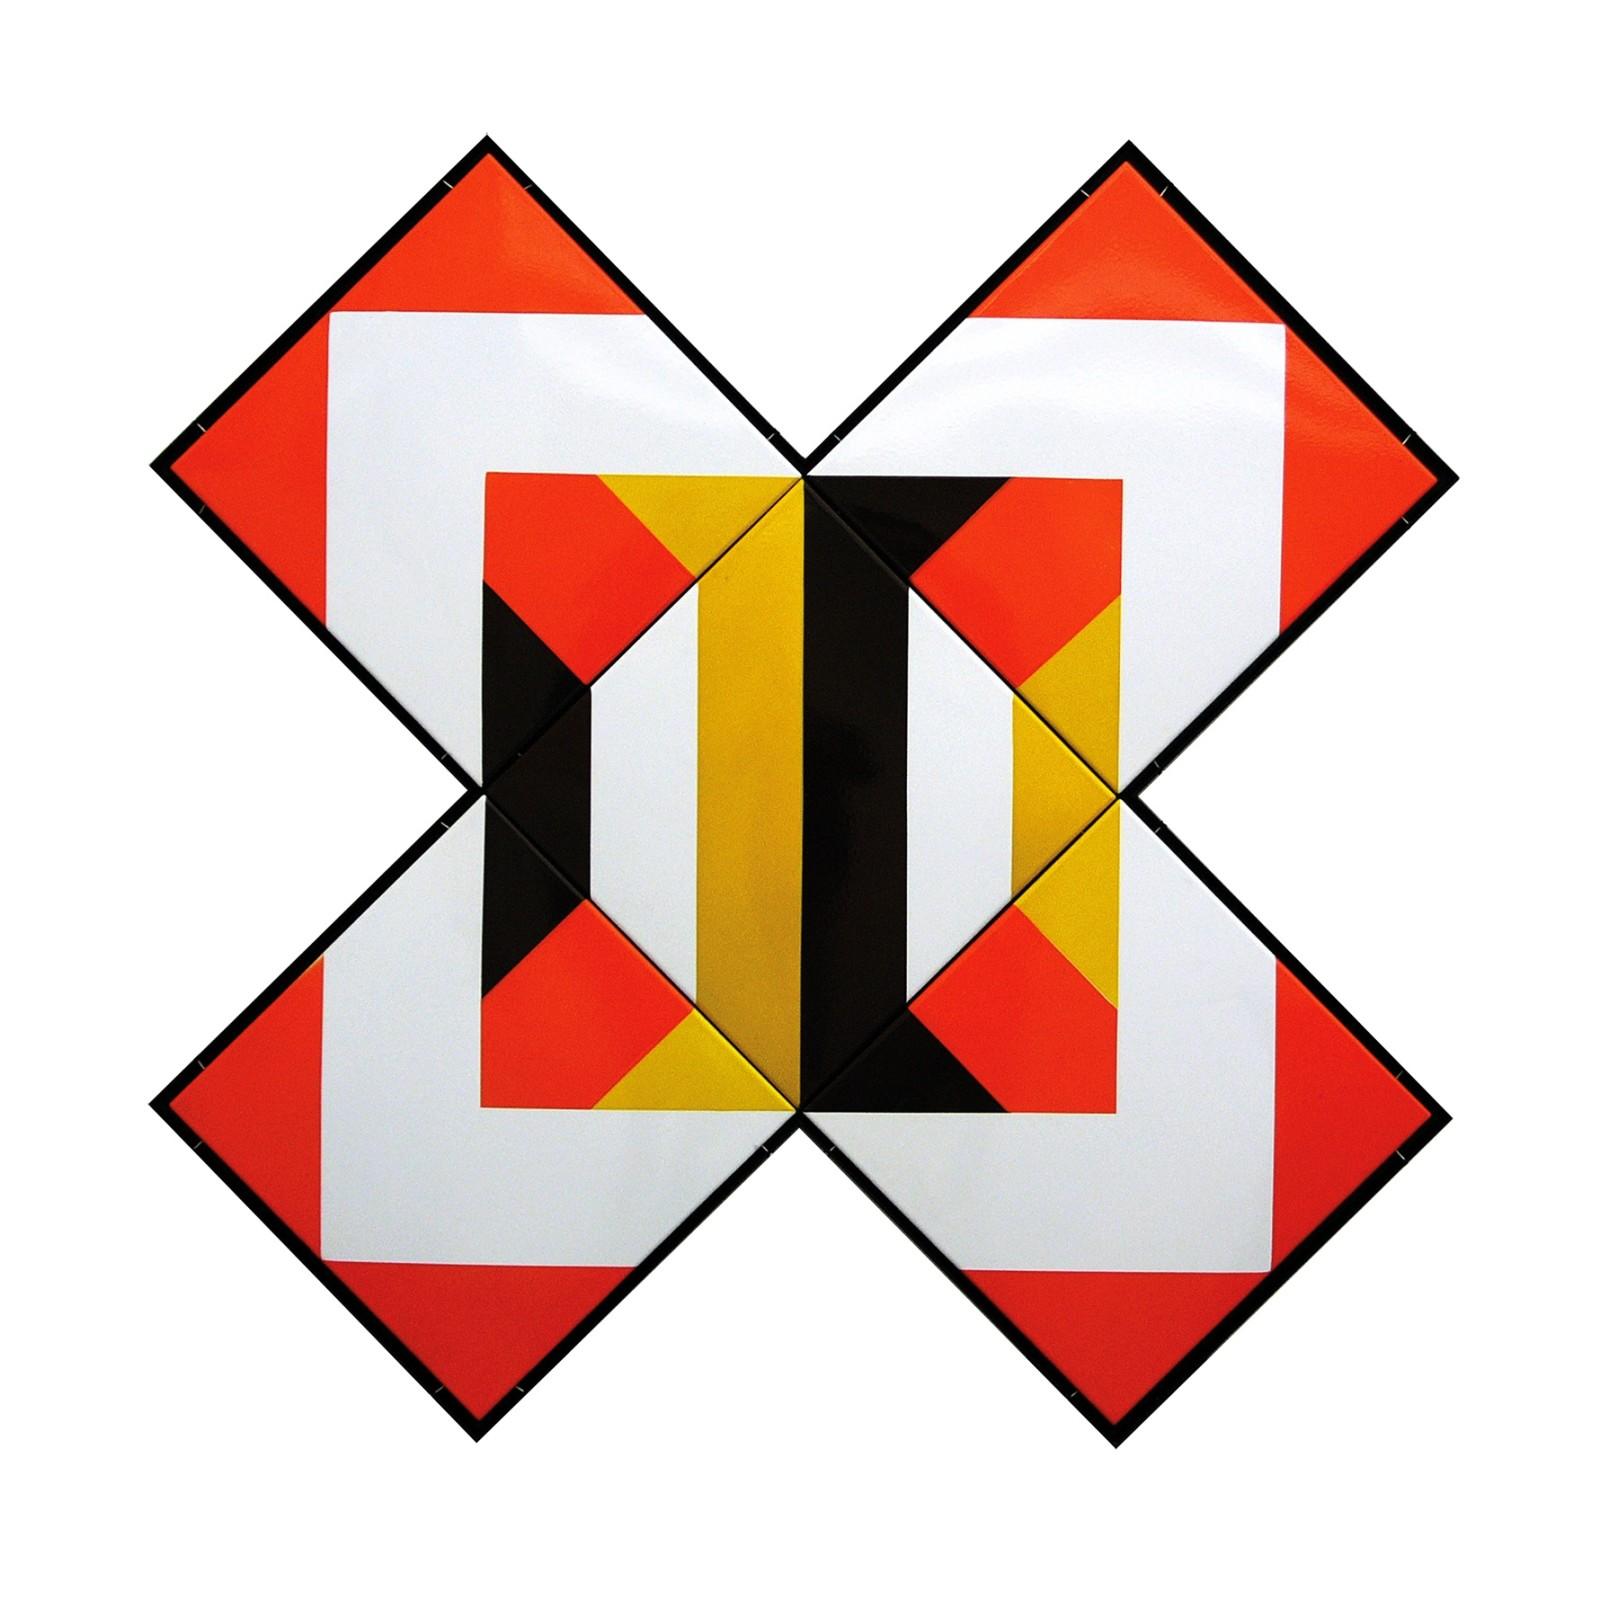 "<span class=""link fancybox-details-link""><a href=""/artists/212-sandor-pinczehelyi/works/10807/"">View Detail Page</a></span><div class=""artist""><span class=""artist""><strong>SÁNDOR PINCZEHELYI</strong></span></div><div class=""title""><em>Imagination</em>, 1972</div><div class=""medium"">Enamel on metal plate</div><div class=""dimensions"">131 x 131 cm<br /> 51 ½ x 51 ½ inches</div>"